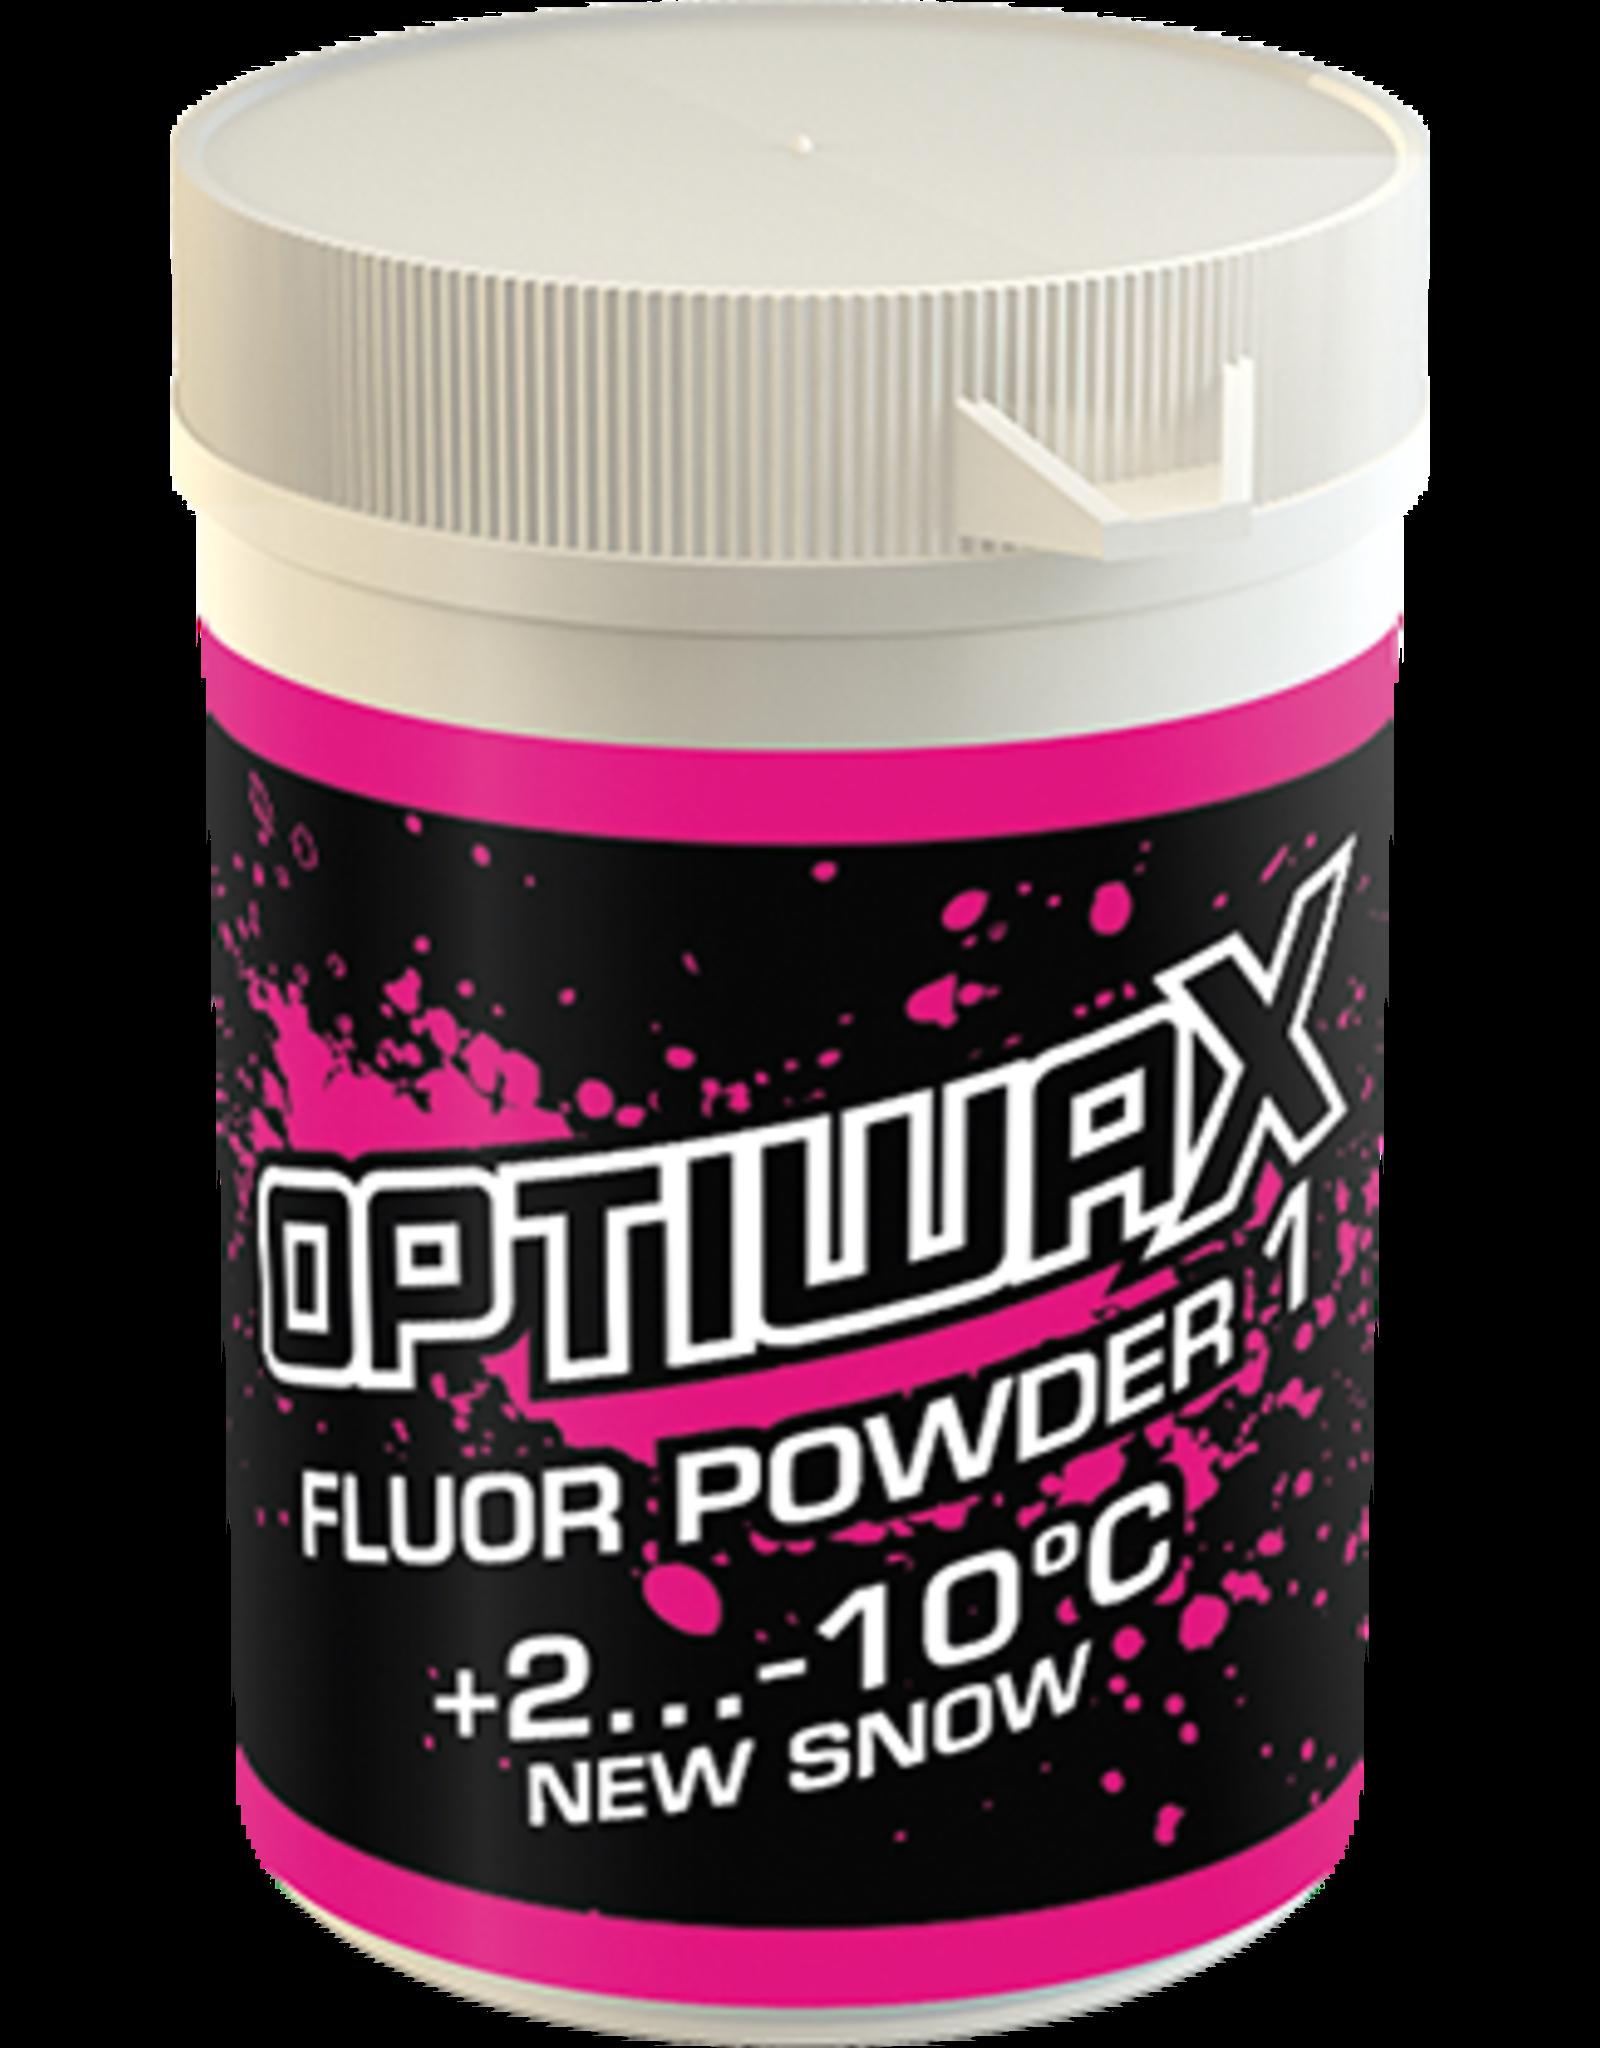 Optiwax Optiwax Fluor Powder 1